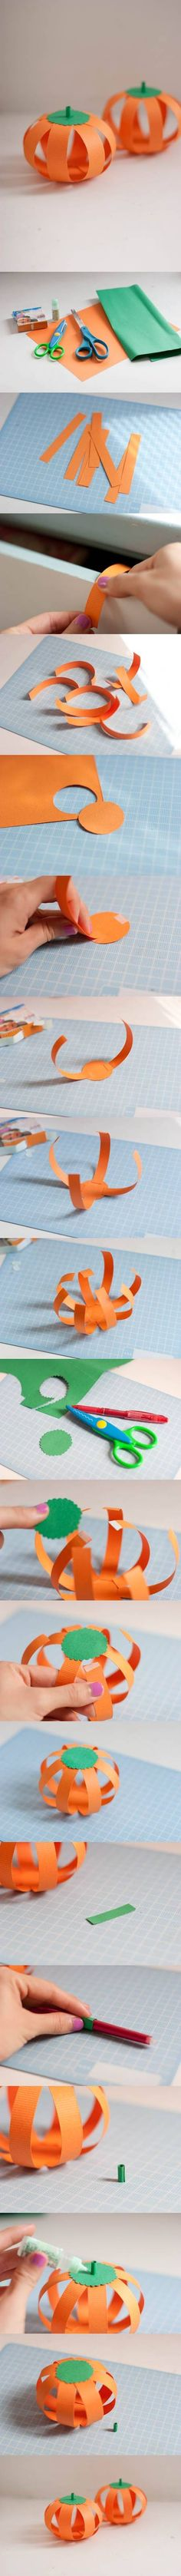 DIY Paper Halloween Pumpkin DIY Paper Halloween Pumpkin by diyforever